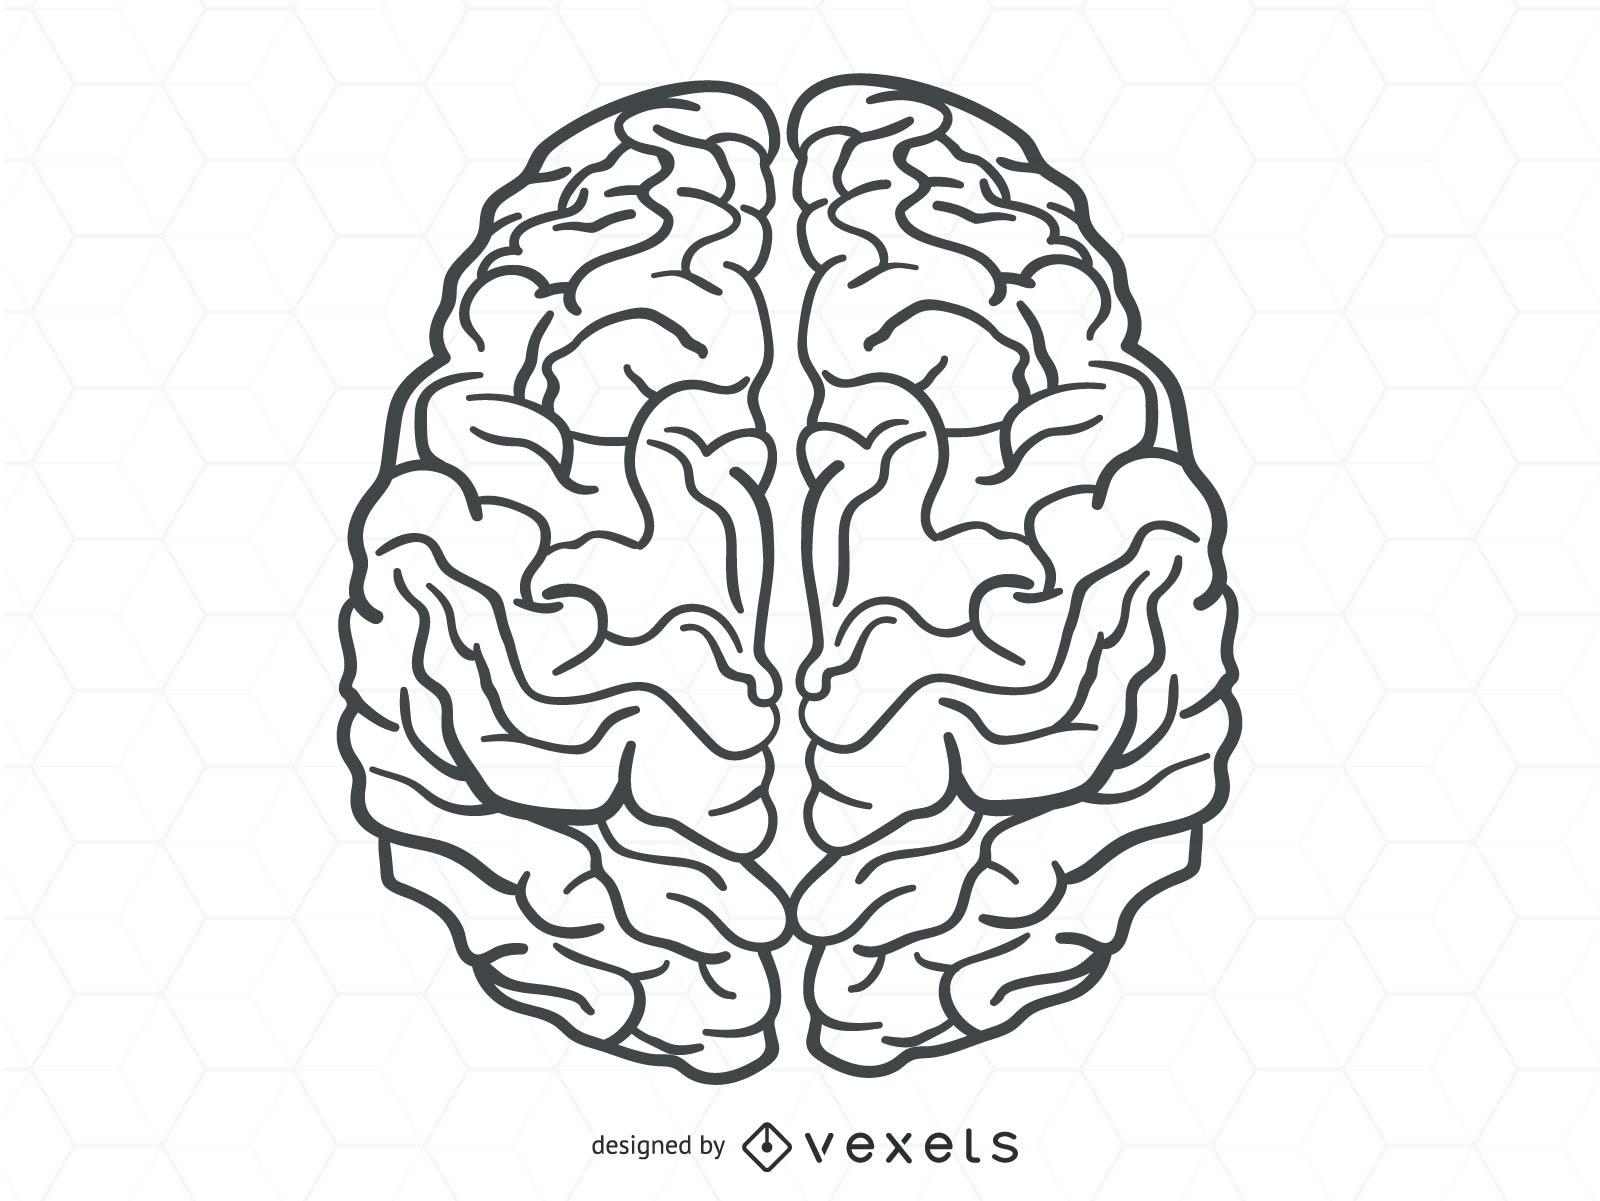 Brain nodes clipart image black and white download Human brain vector - Vector download image black and white download